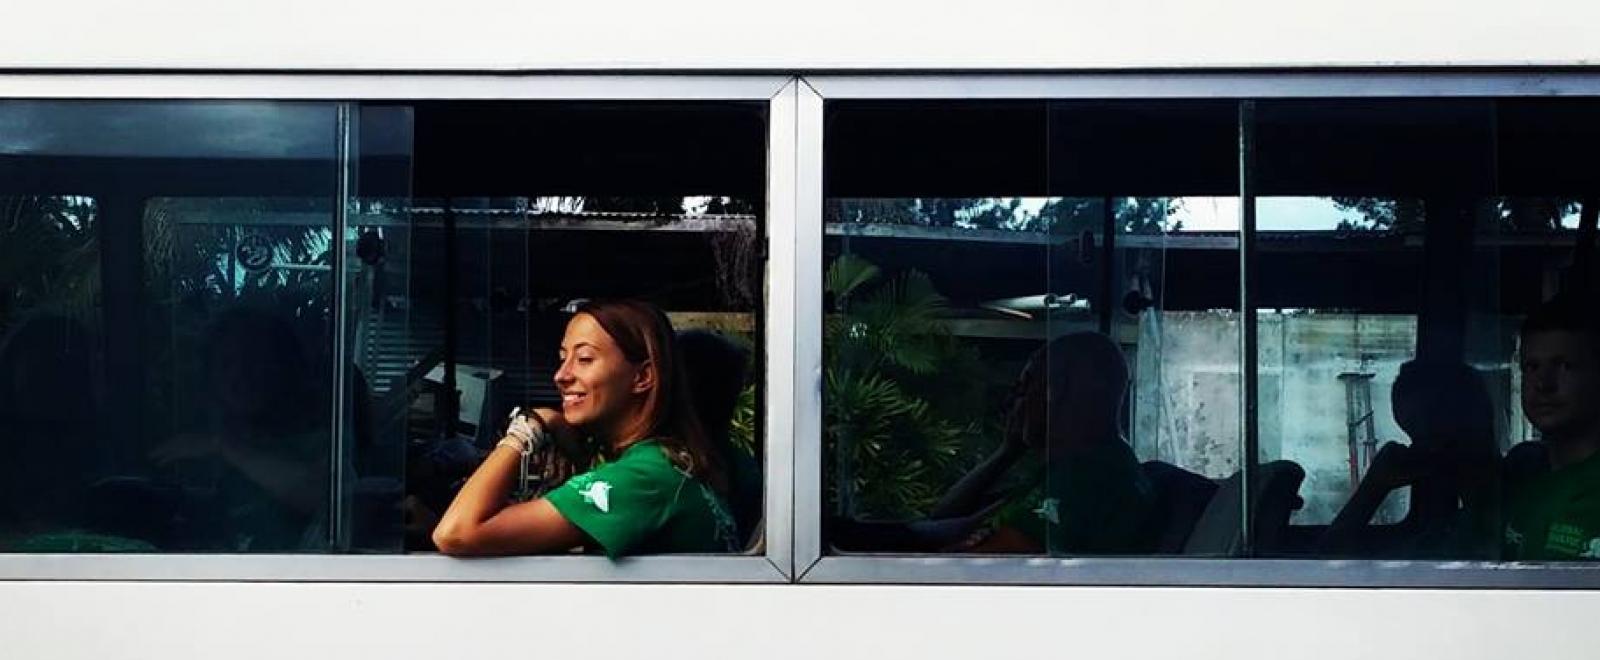 Volunteer travelling in a minibus